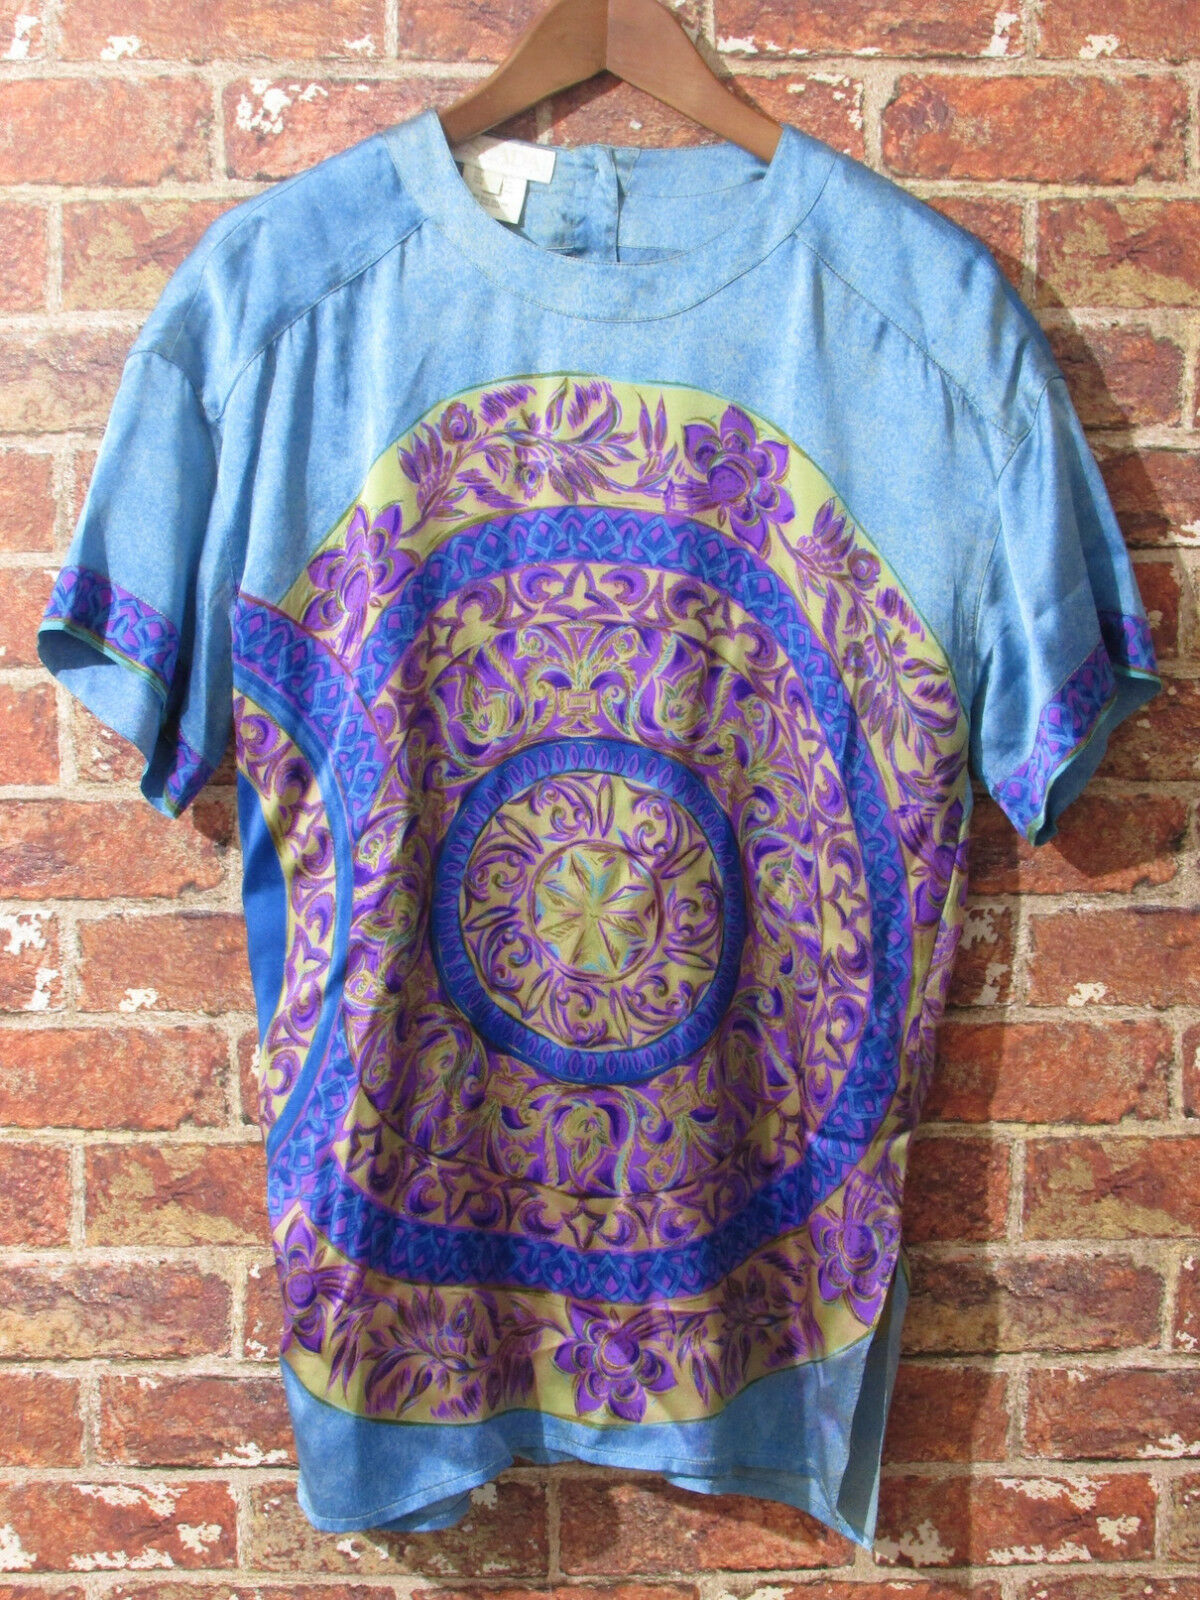 VTG ESCADA 100% Silk Tunic Blouse Dress sz 36 US 4 S Medallion Floral Designer